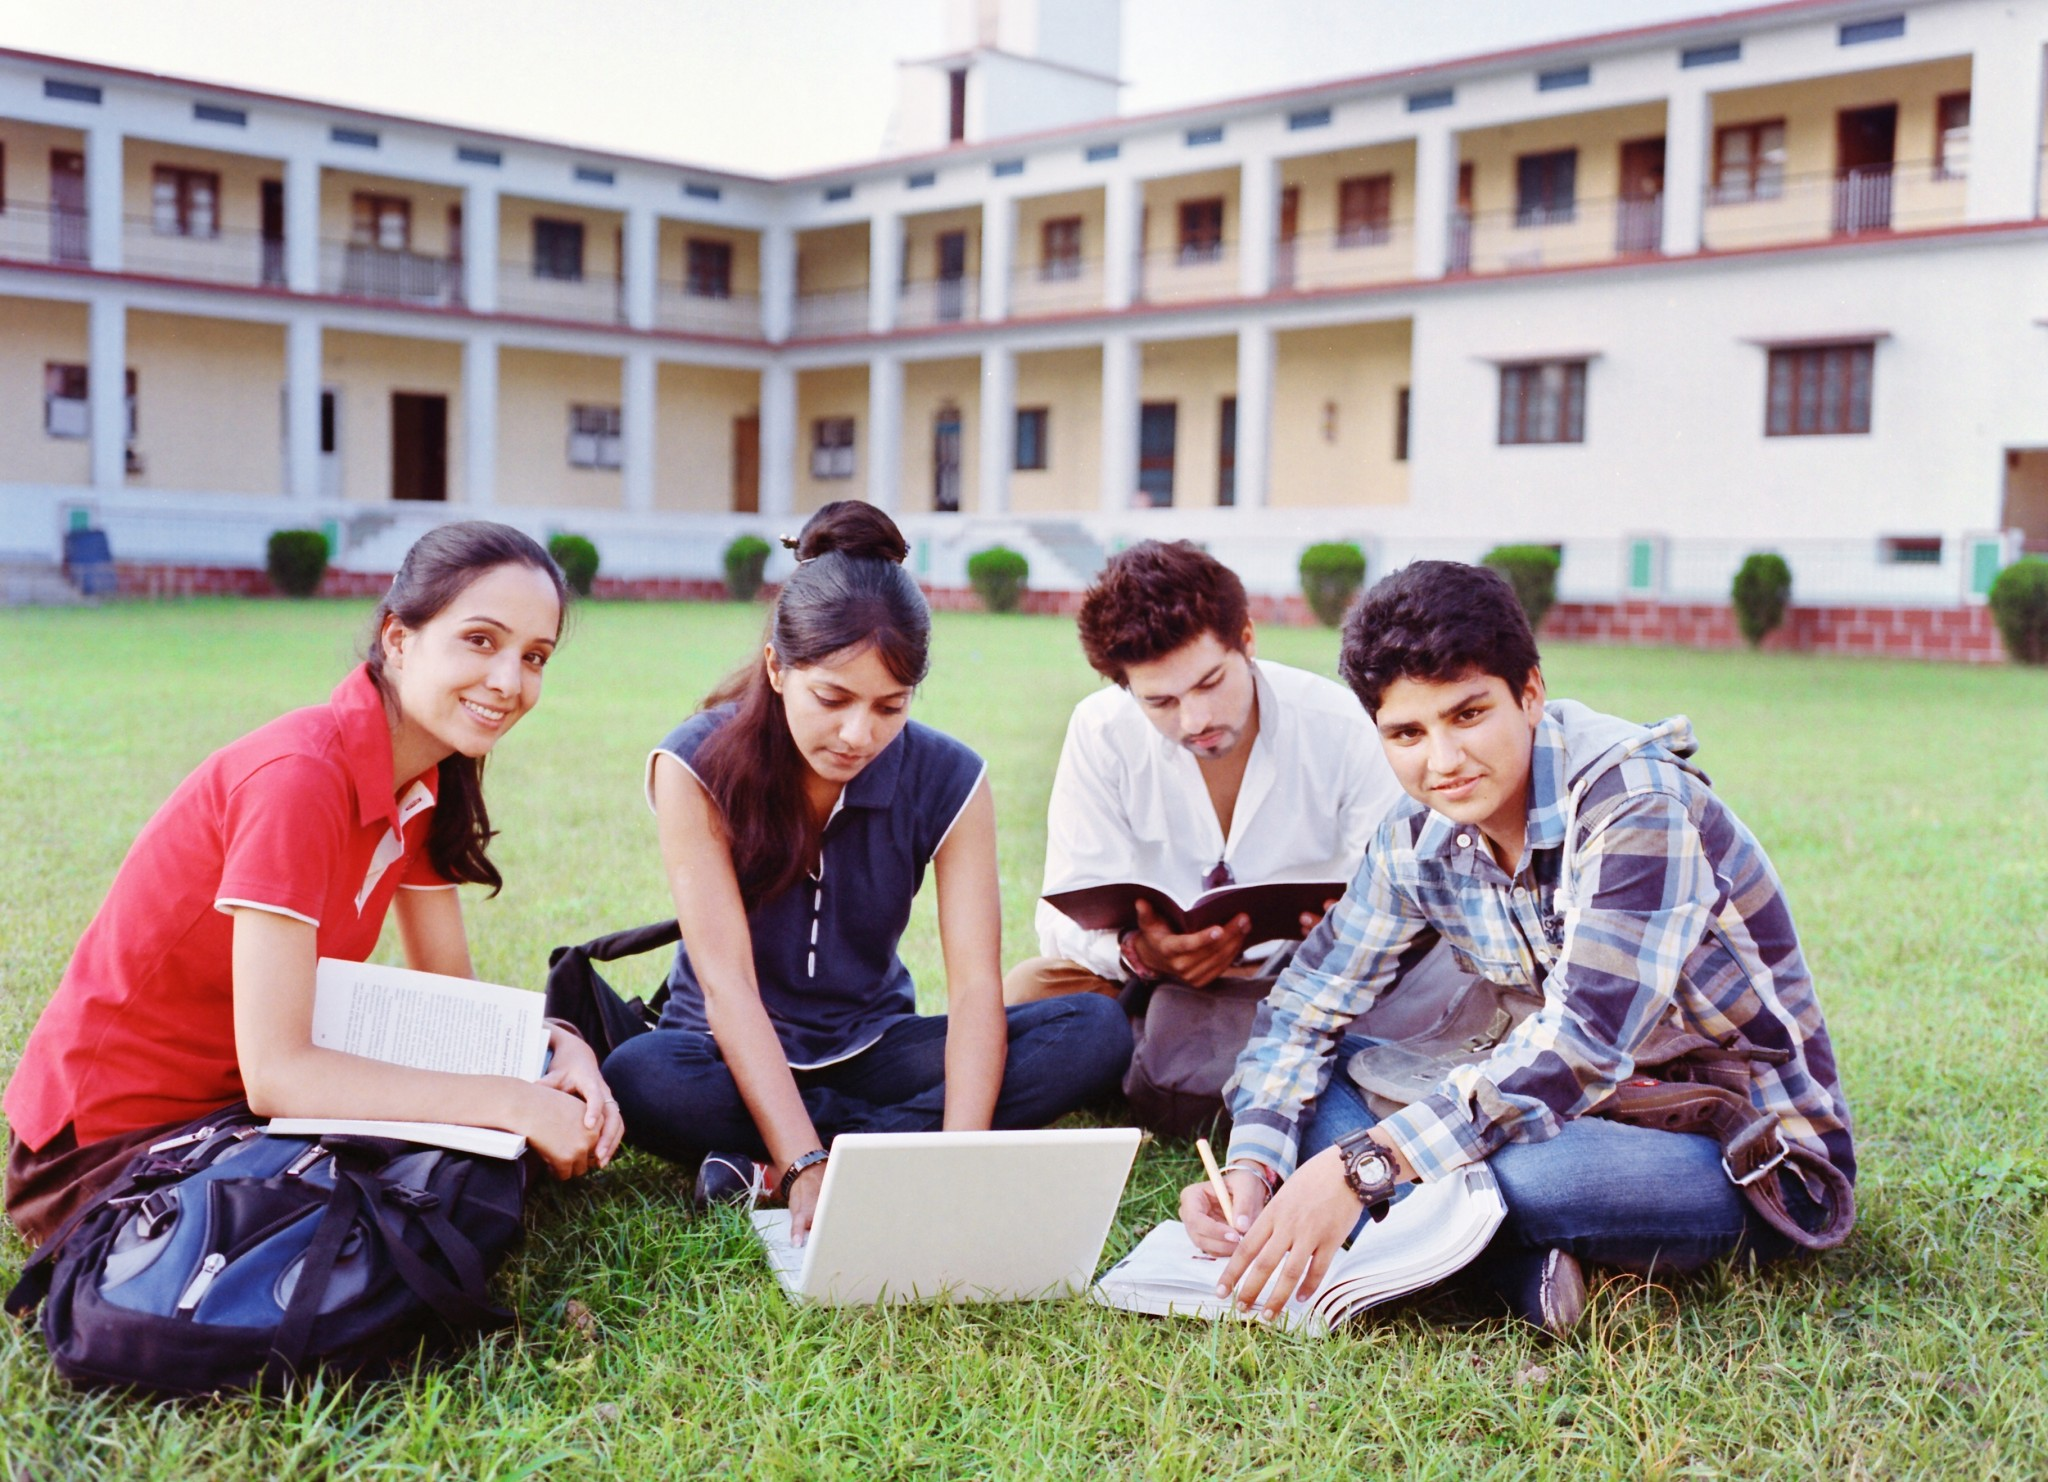 fewer_eu_students_studying_abroad.jpg